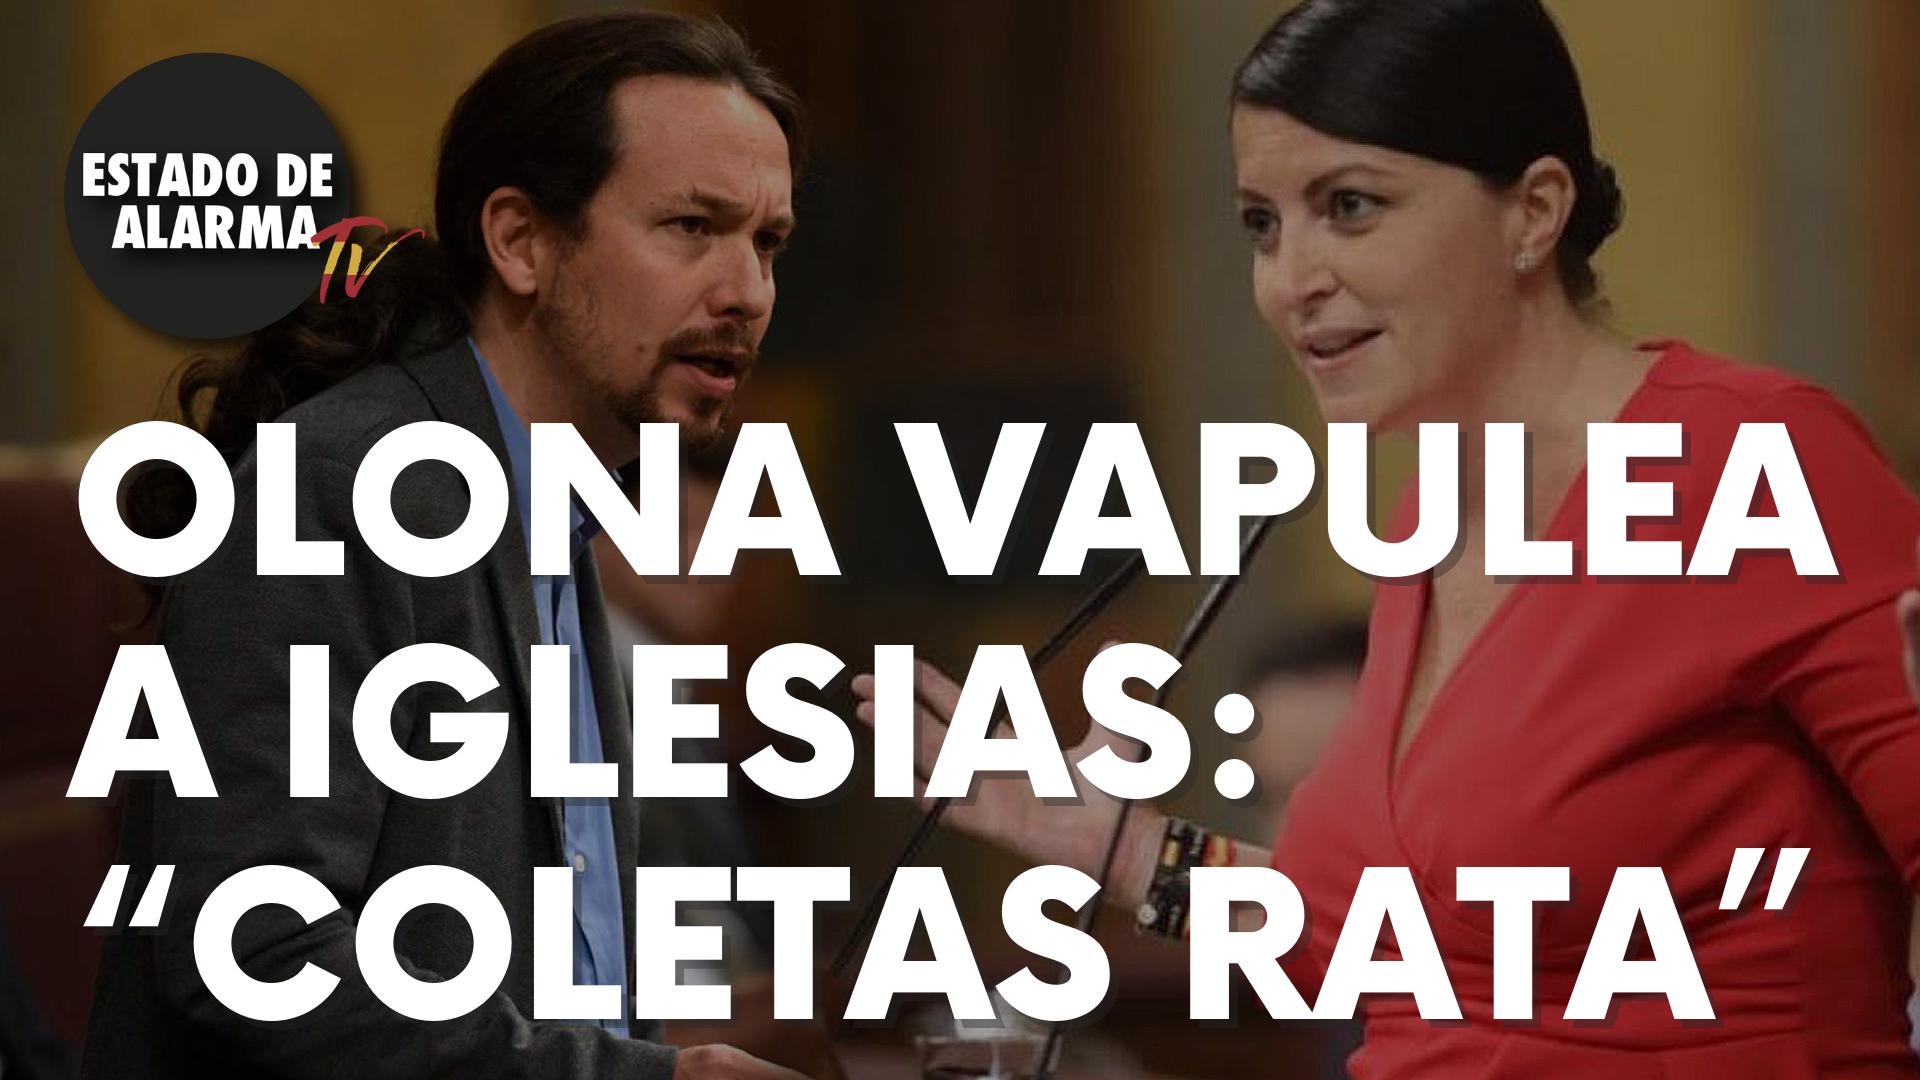 "Olona vapulea a Iglesias: ""Coletas rata"""